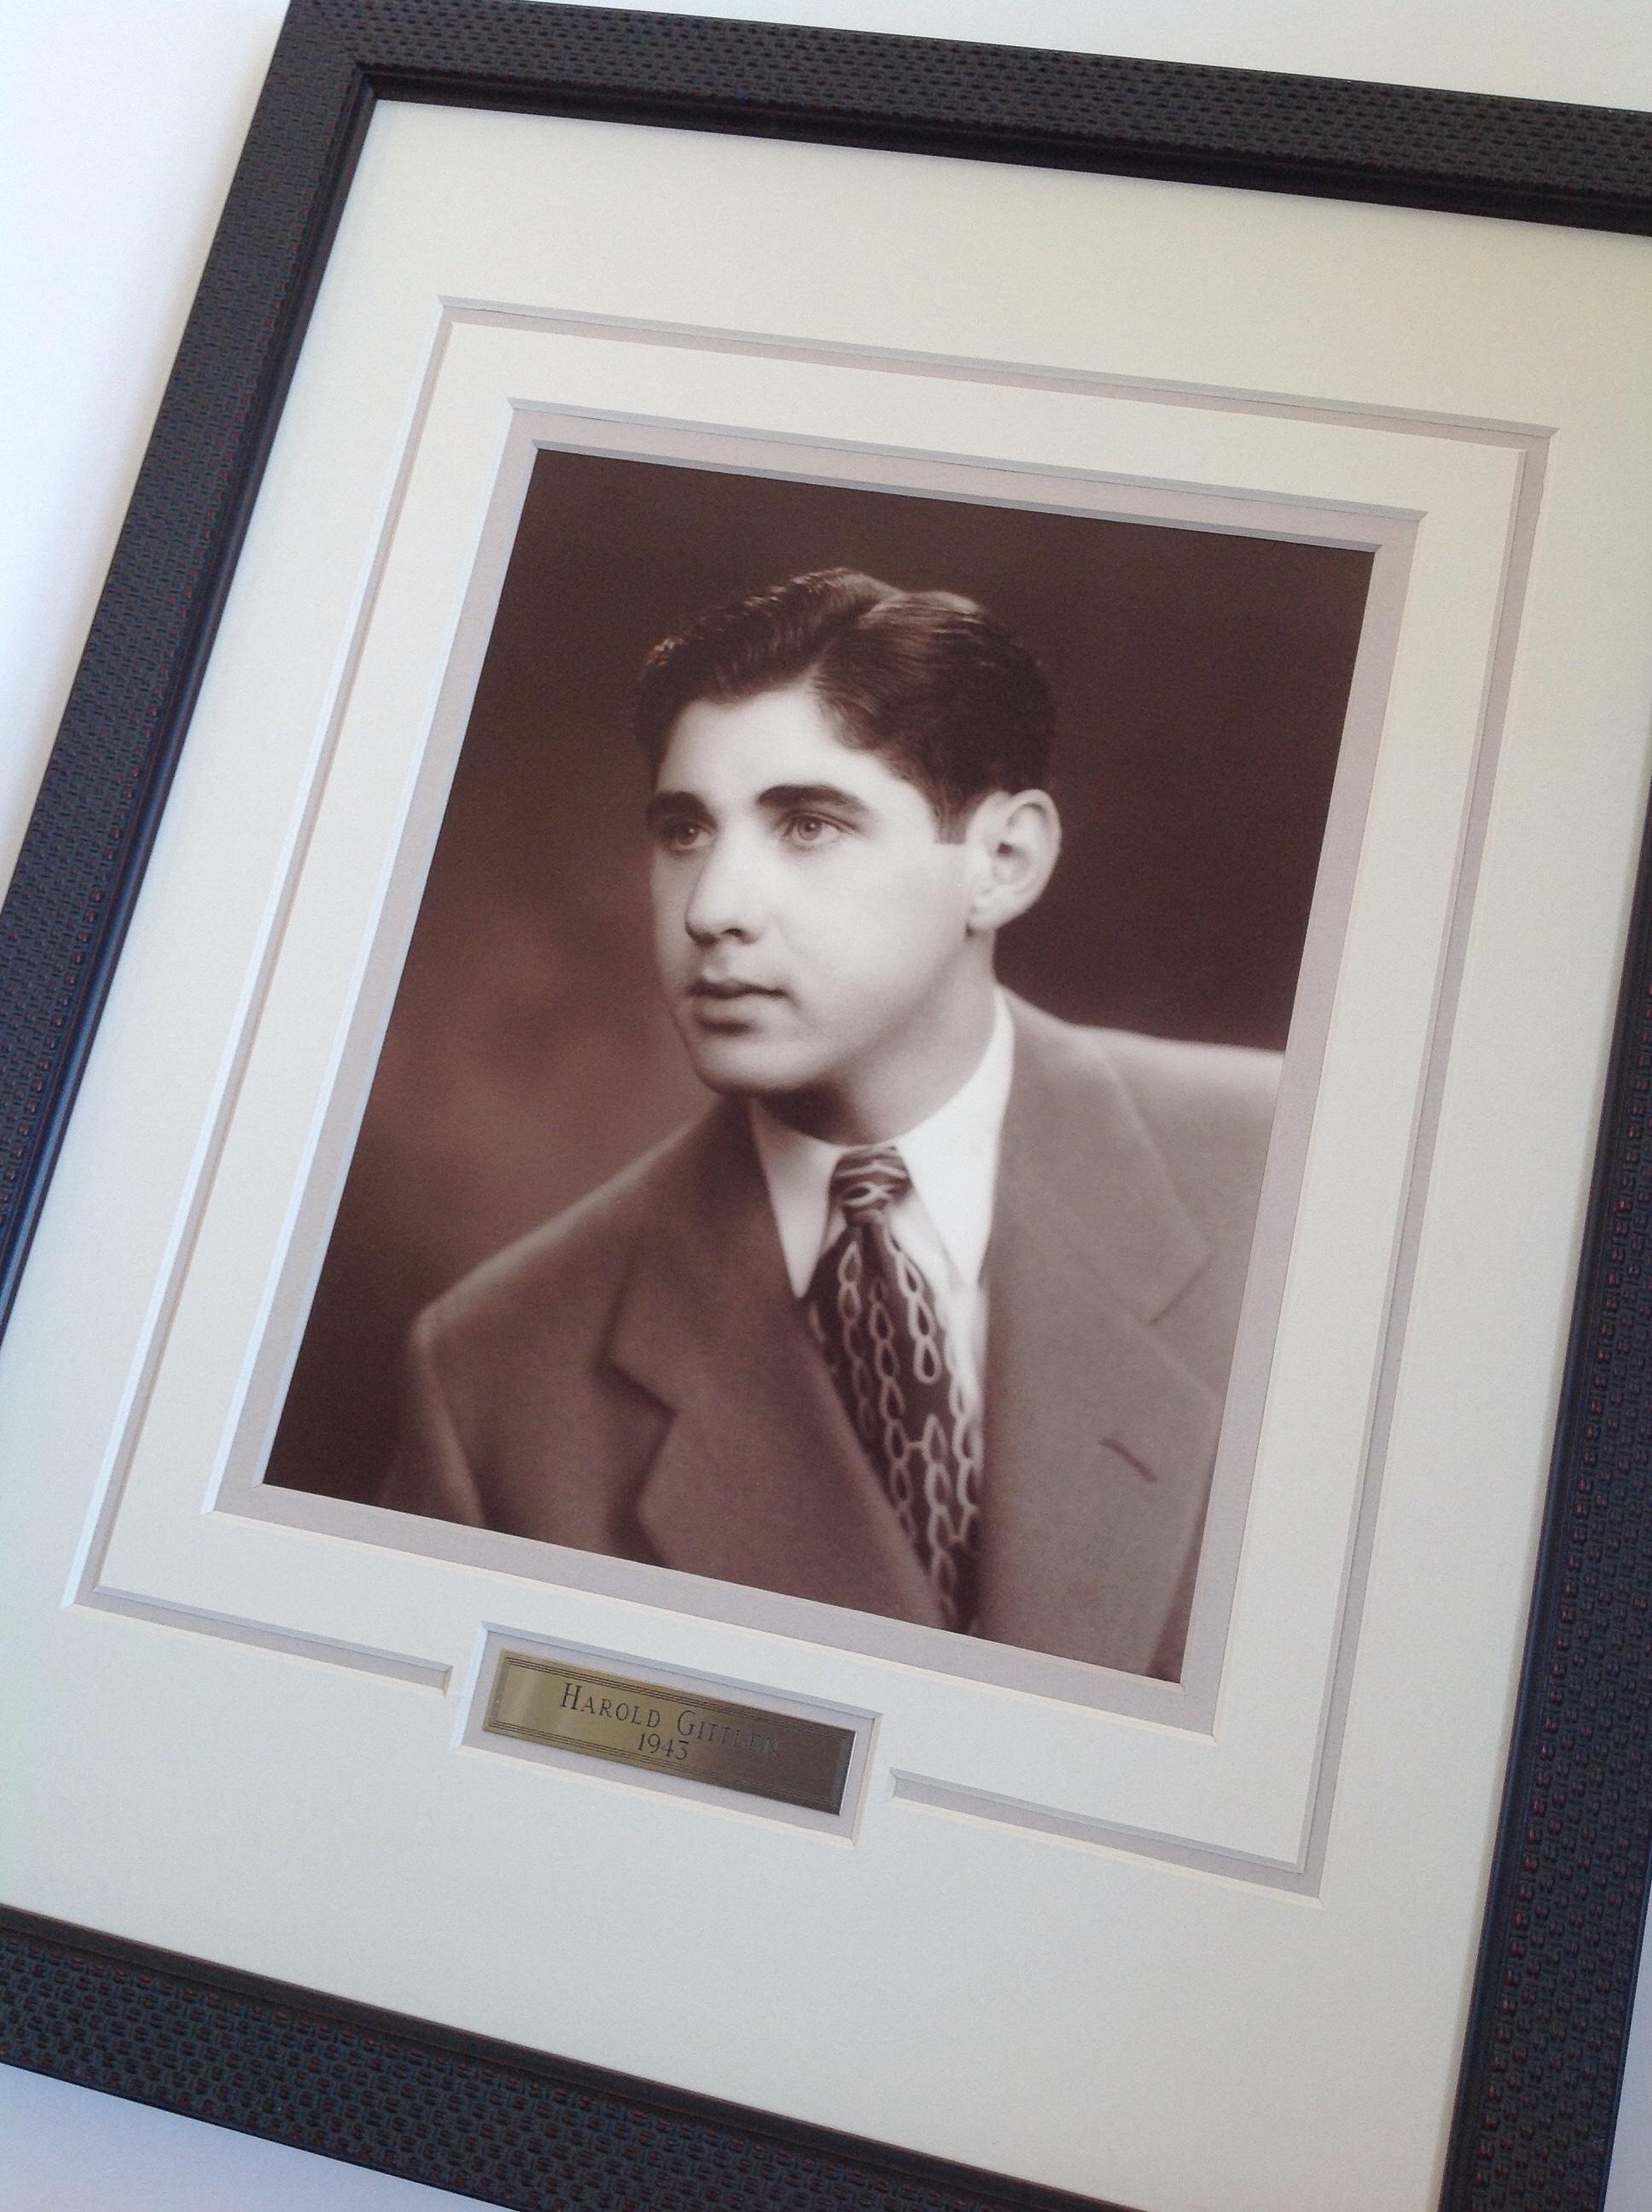 Quality custom framed photograph